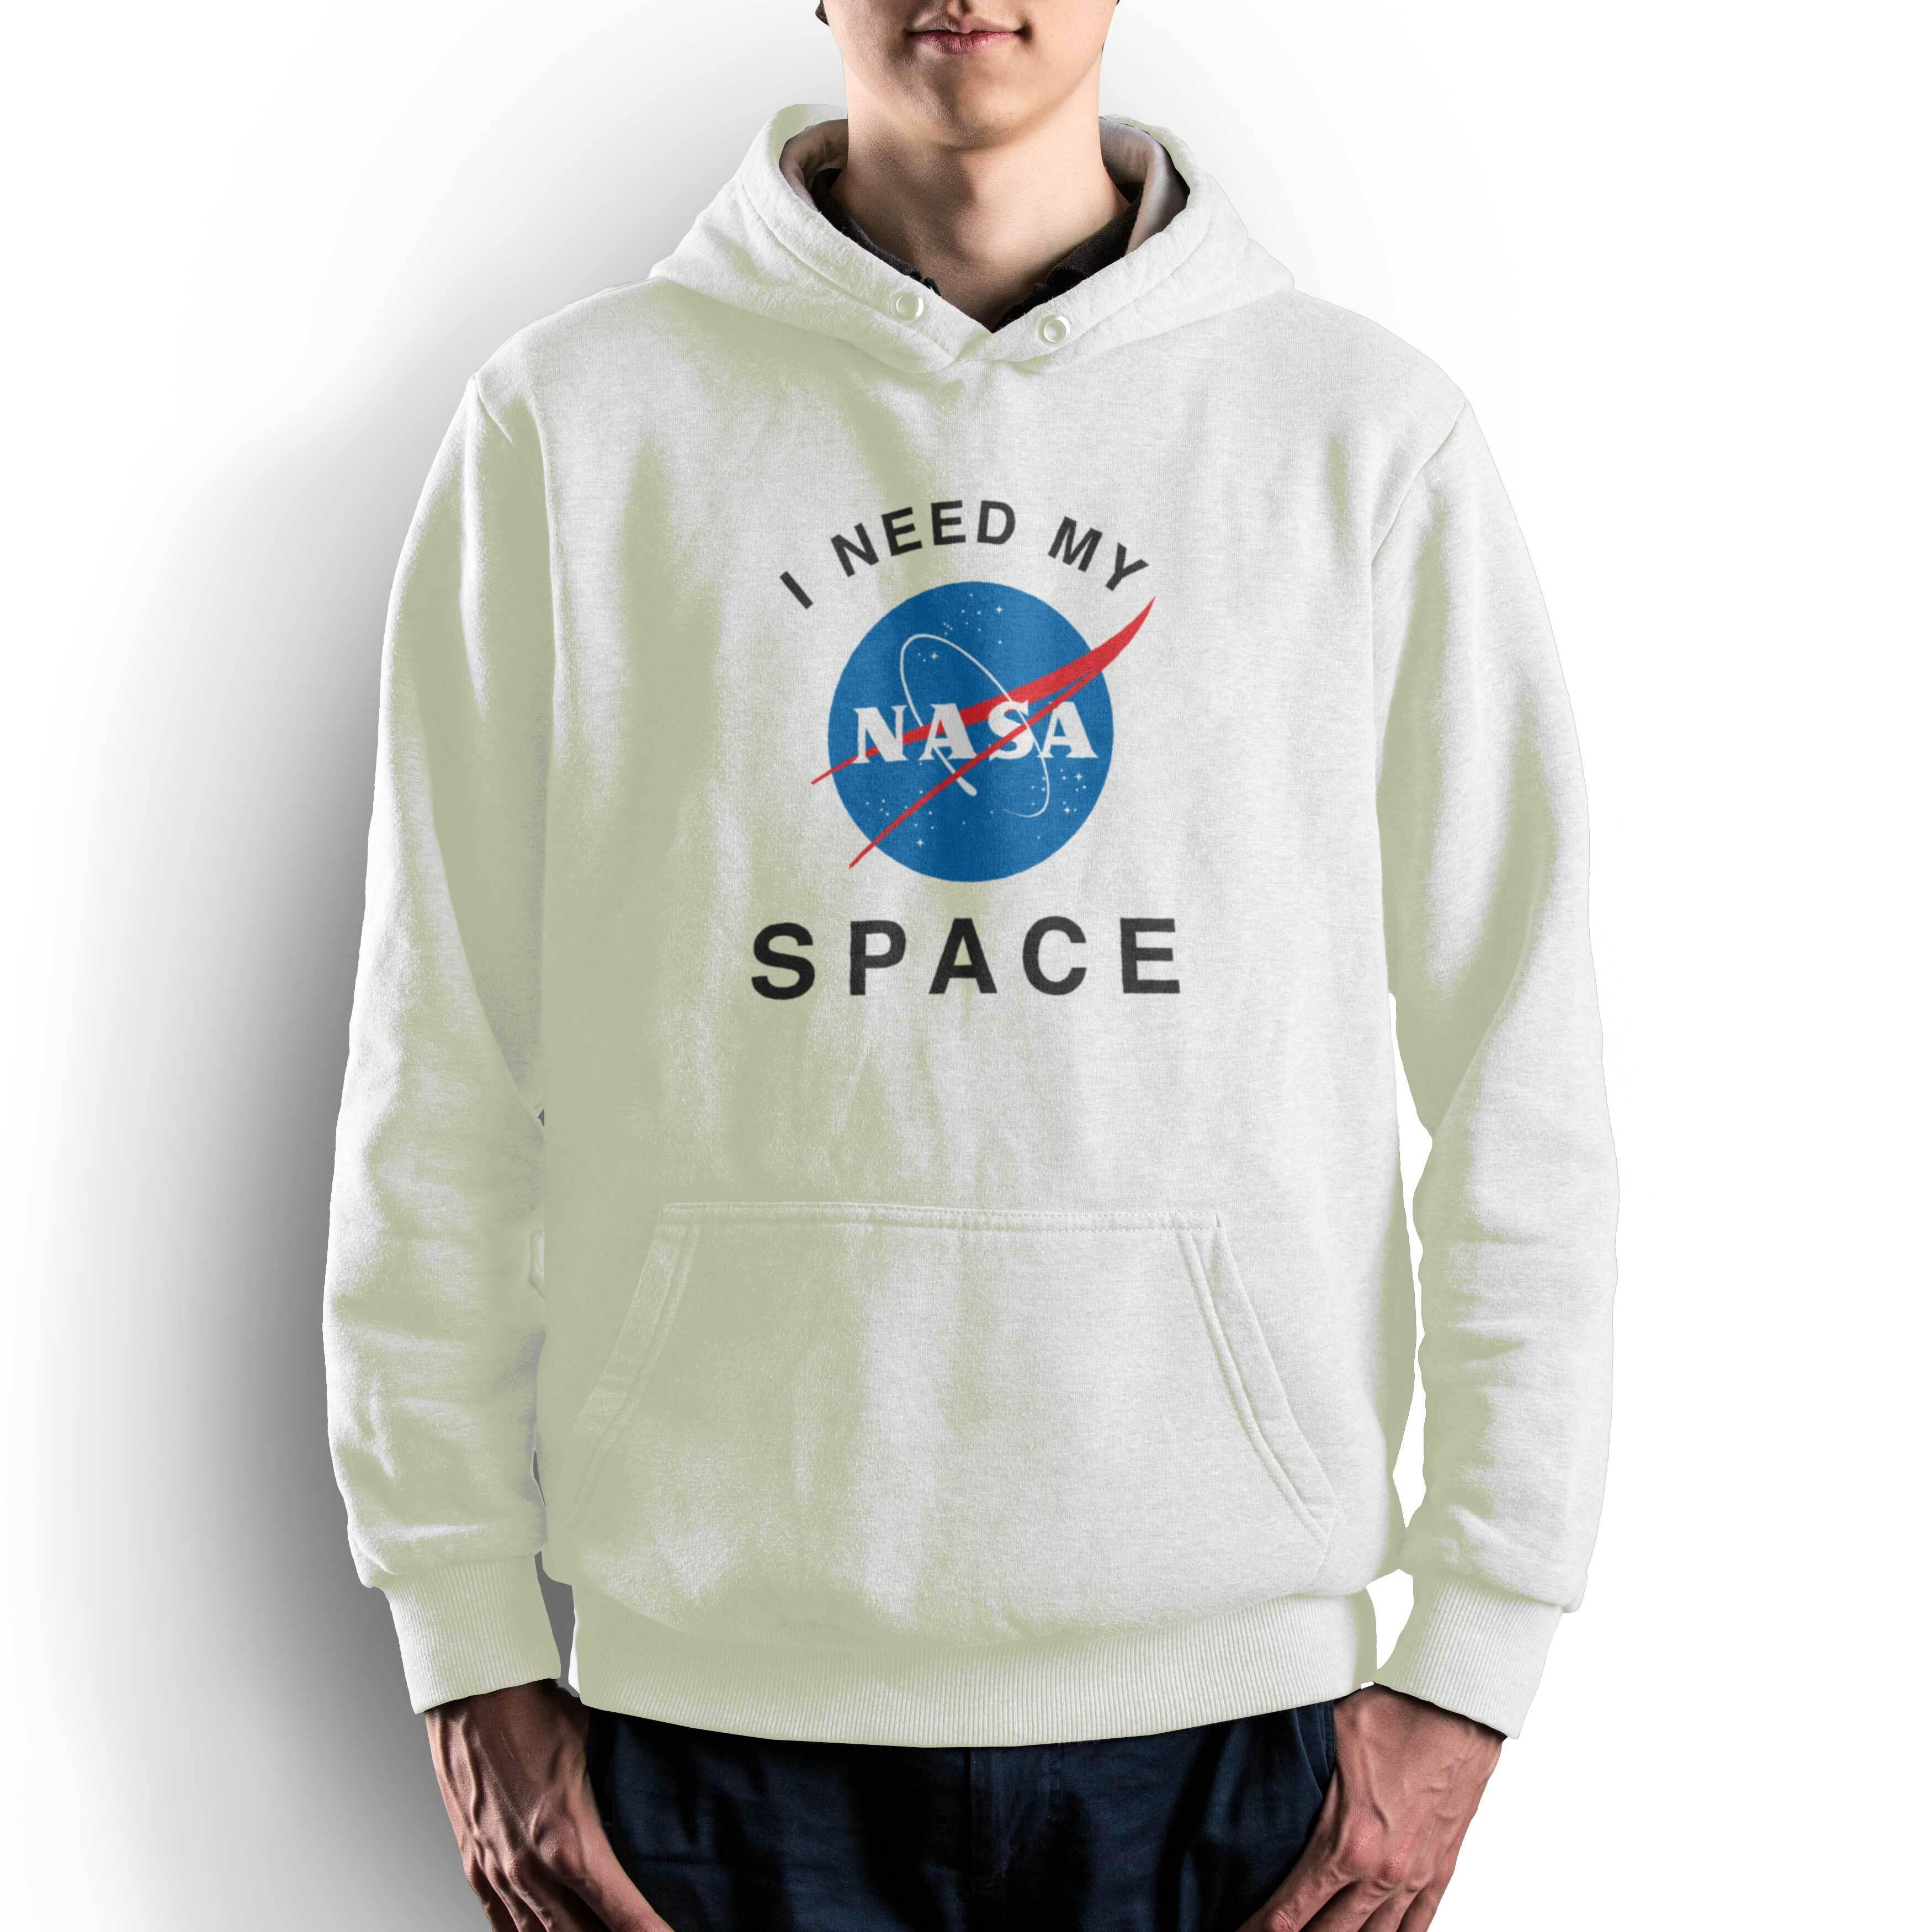 NASA公認(アメリカ航空宇宙局)・パーカー・JERZEES(ジャージーズ)ボディ・インサイニア(ミートボール)・ホワイト